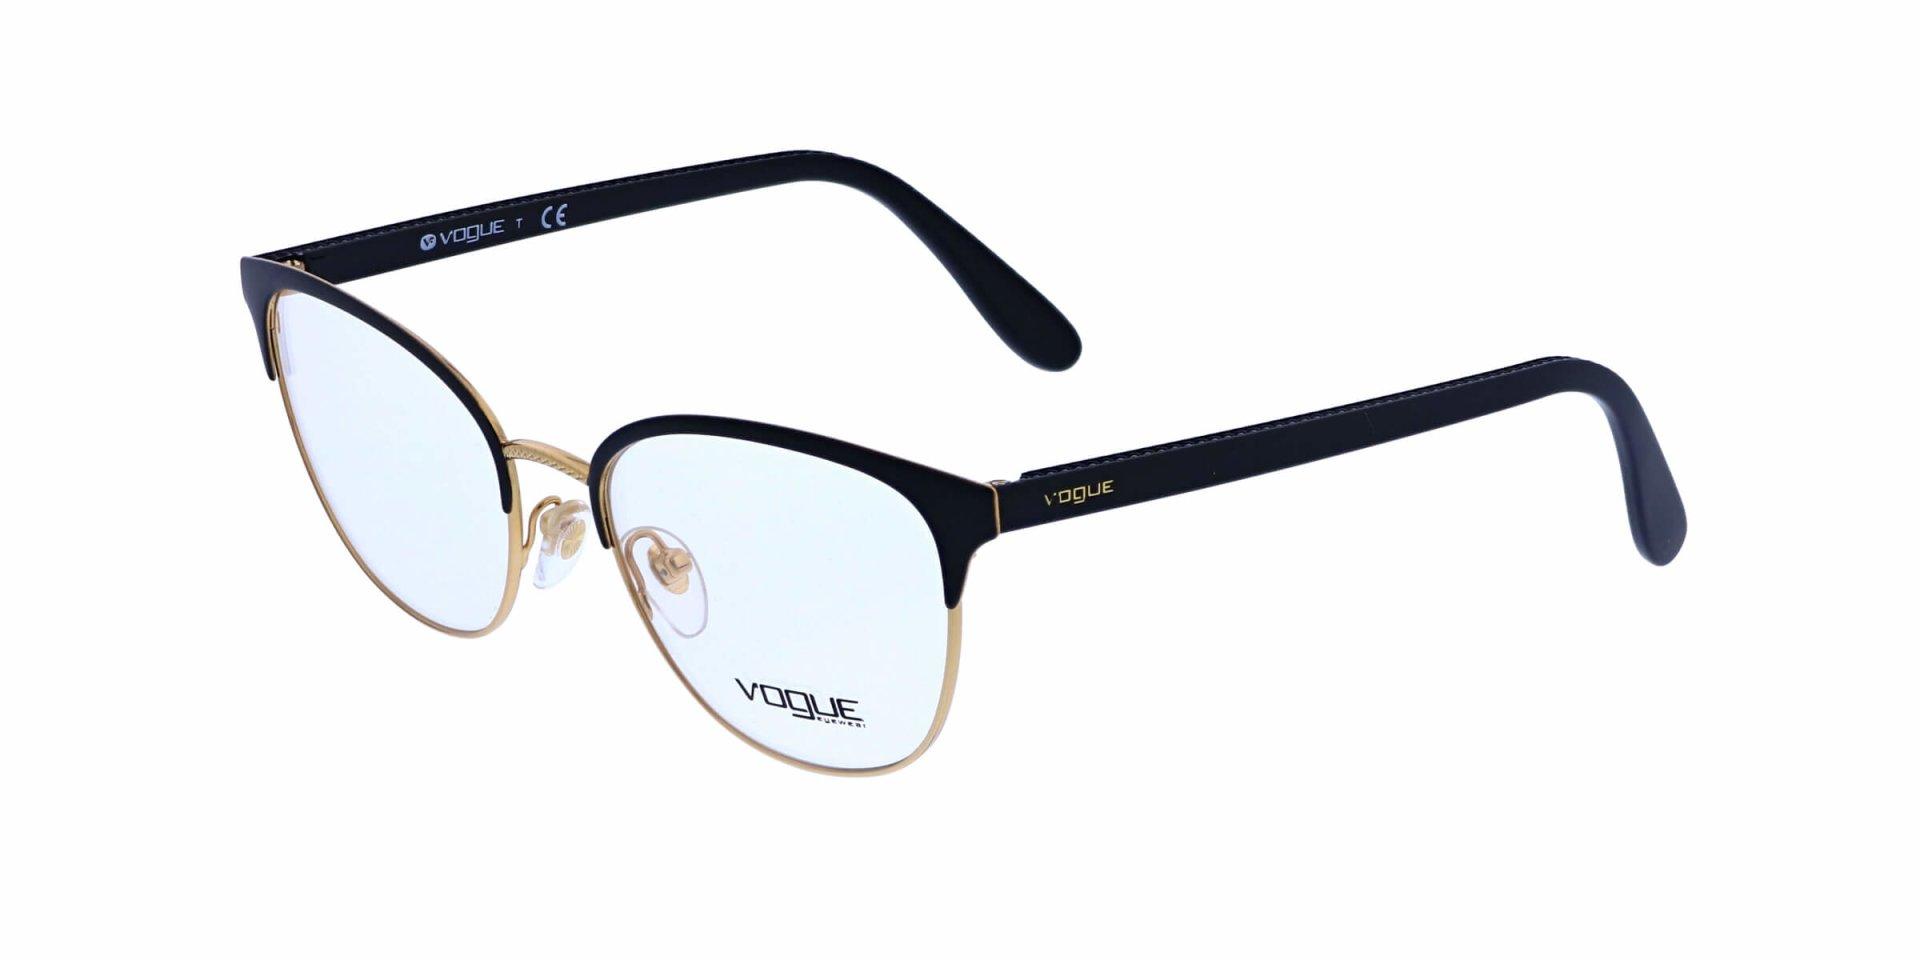 Sunglasses Vogue Opticlasa